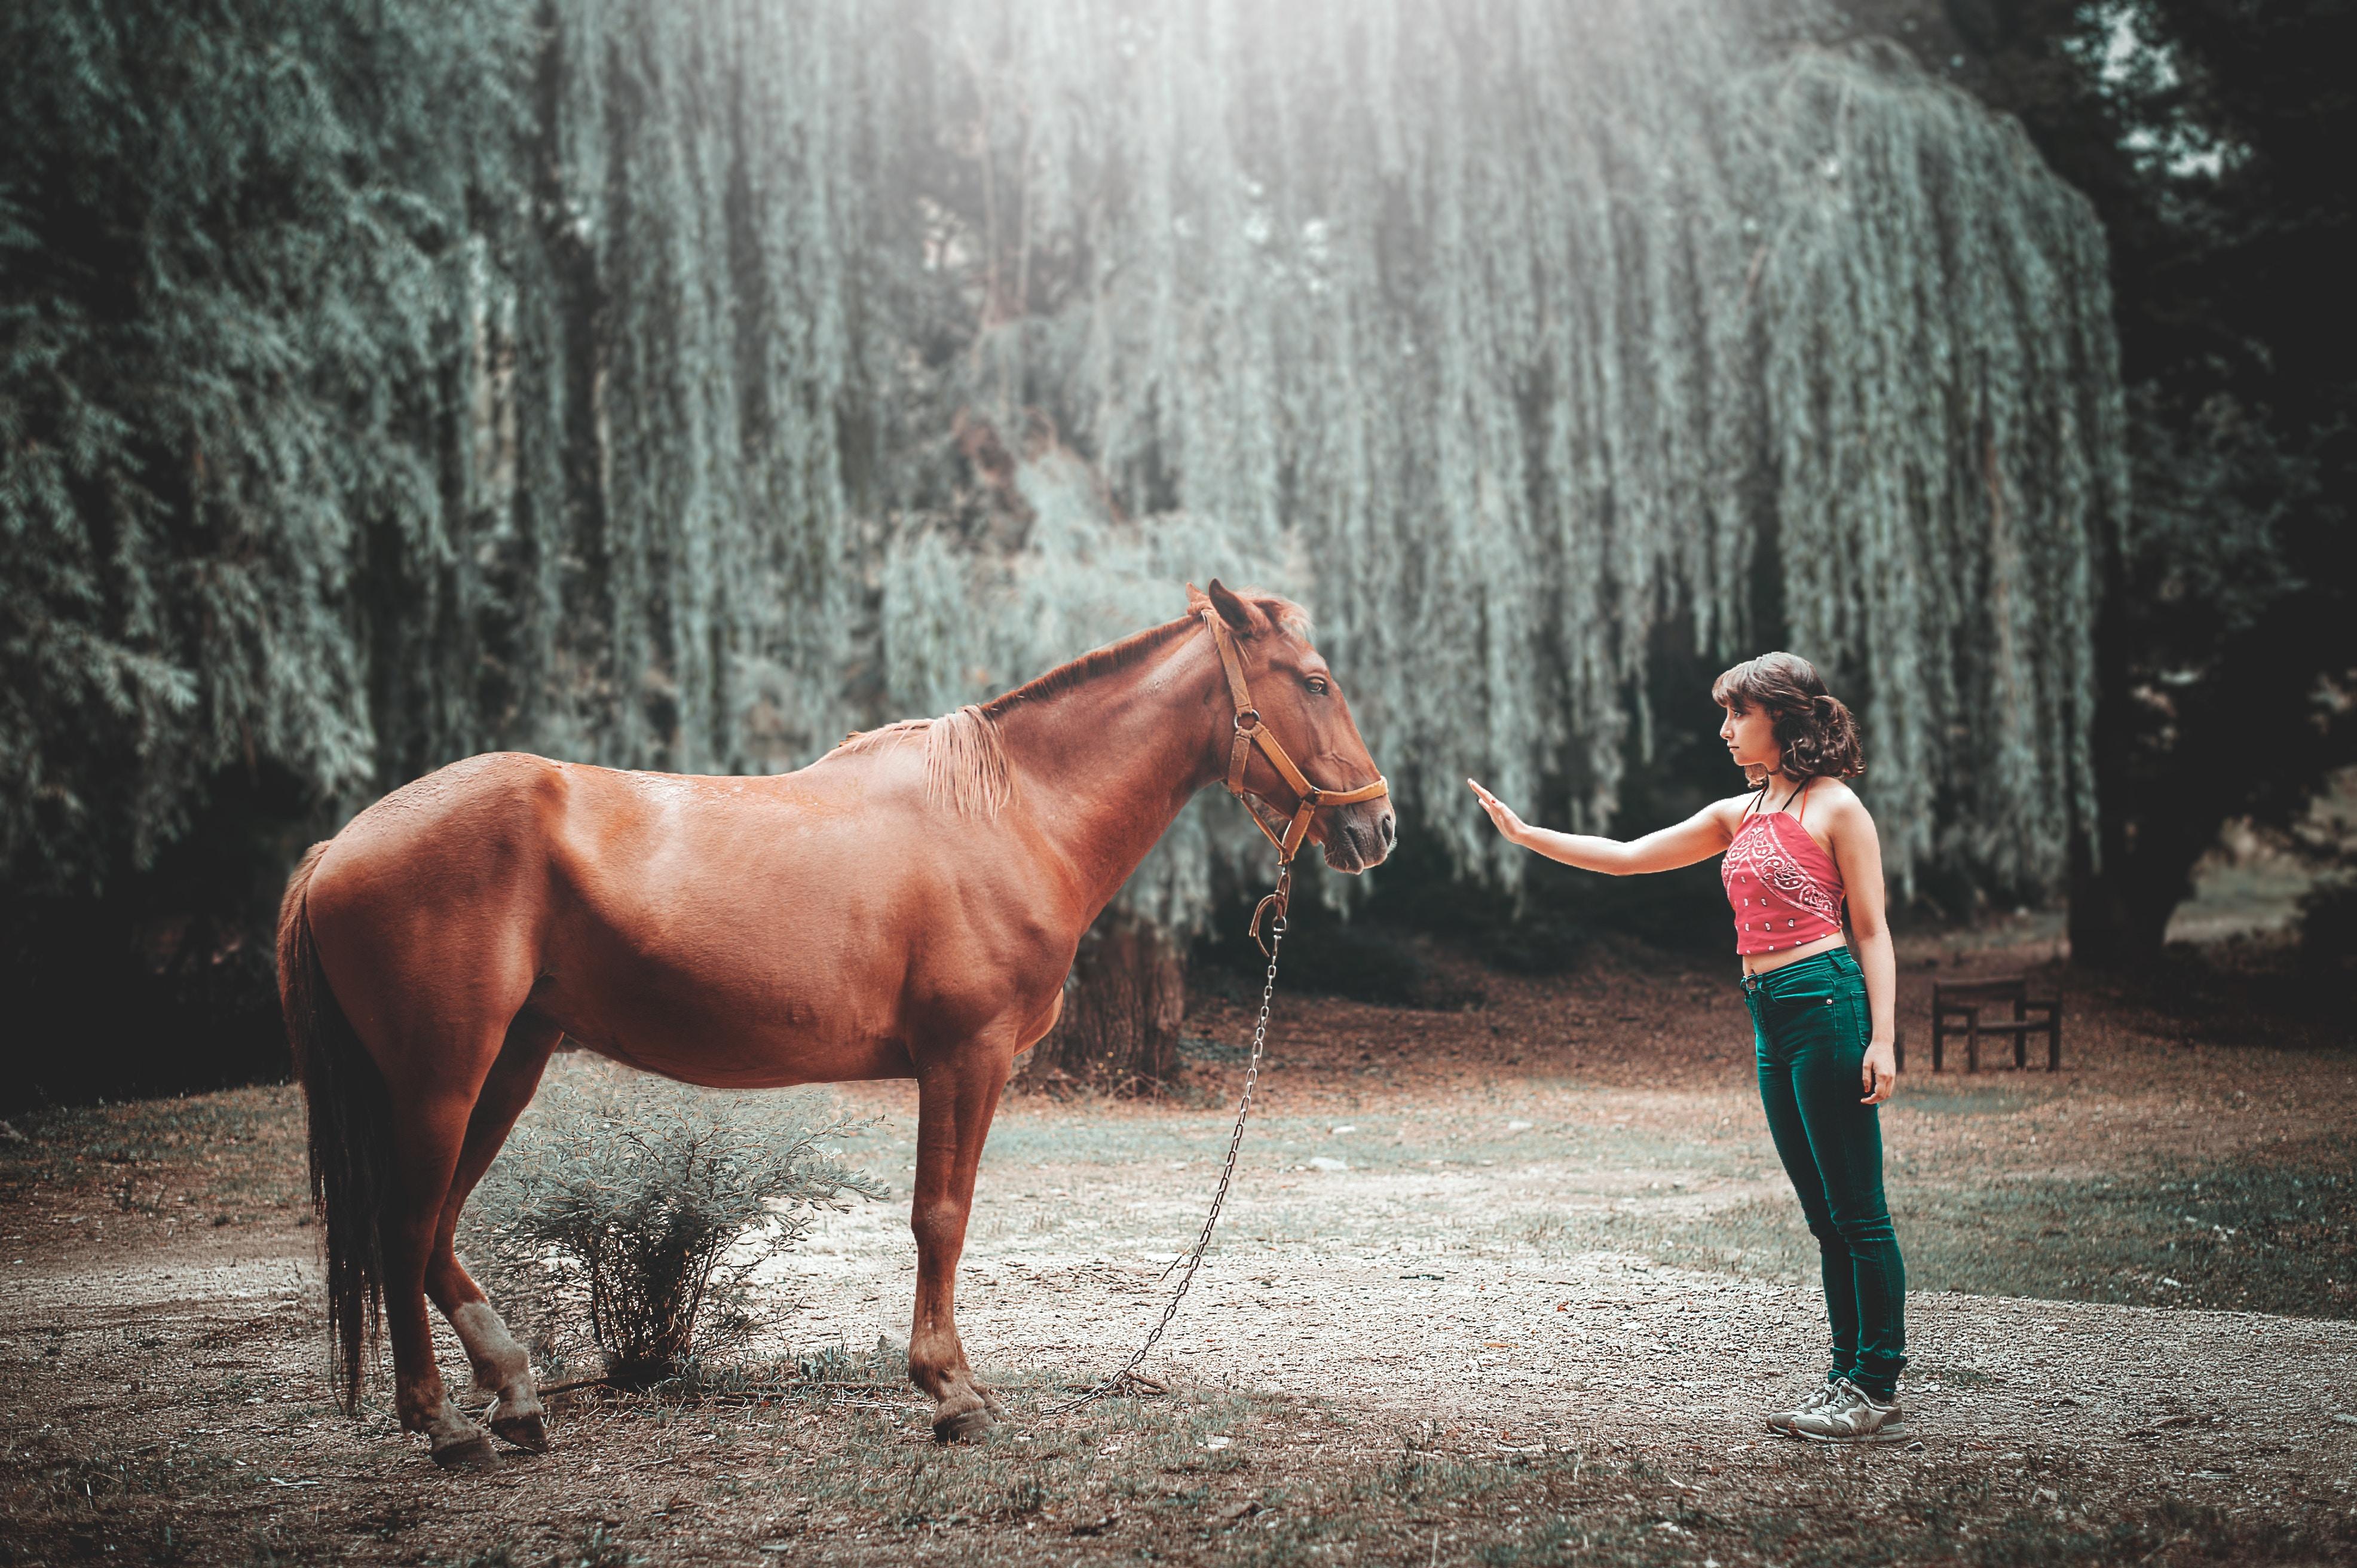 Equine Studies 12 Summer Opportunity